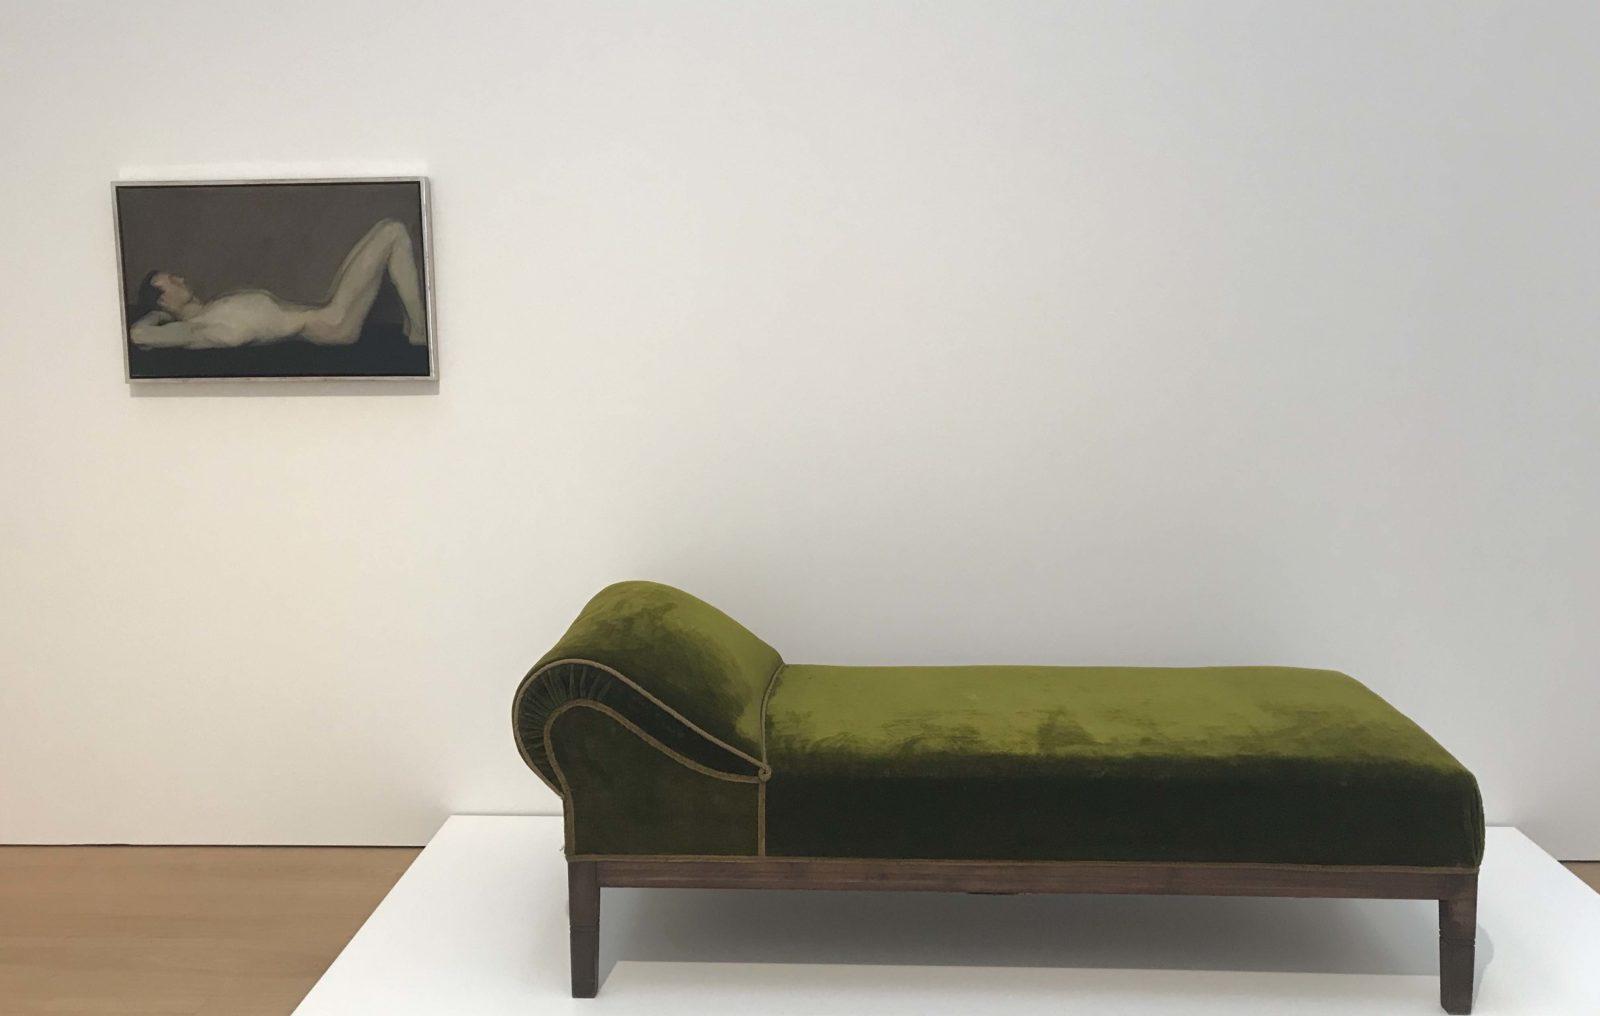 Adlof Loos) Divan, Max Kurzweil. Homme nu allongé